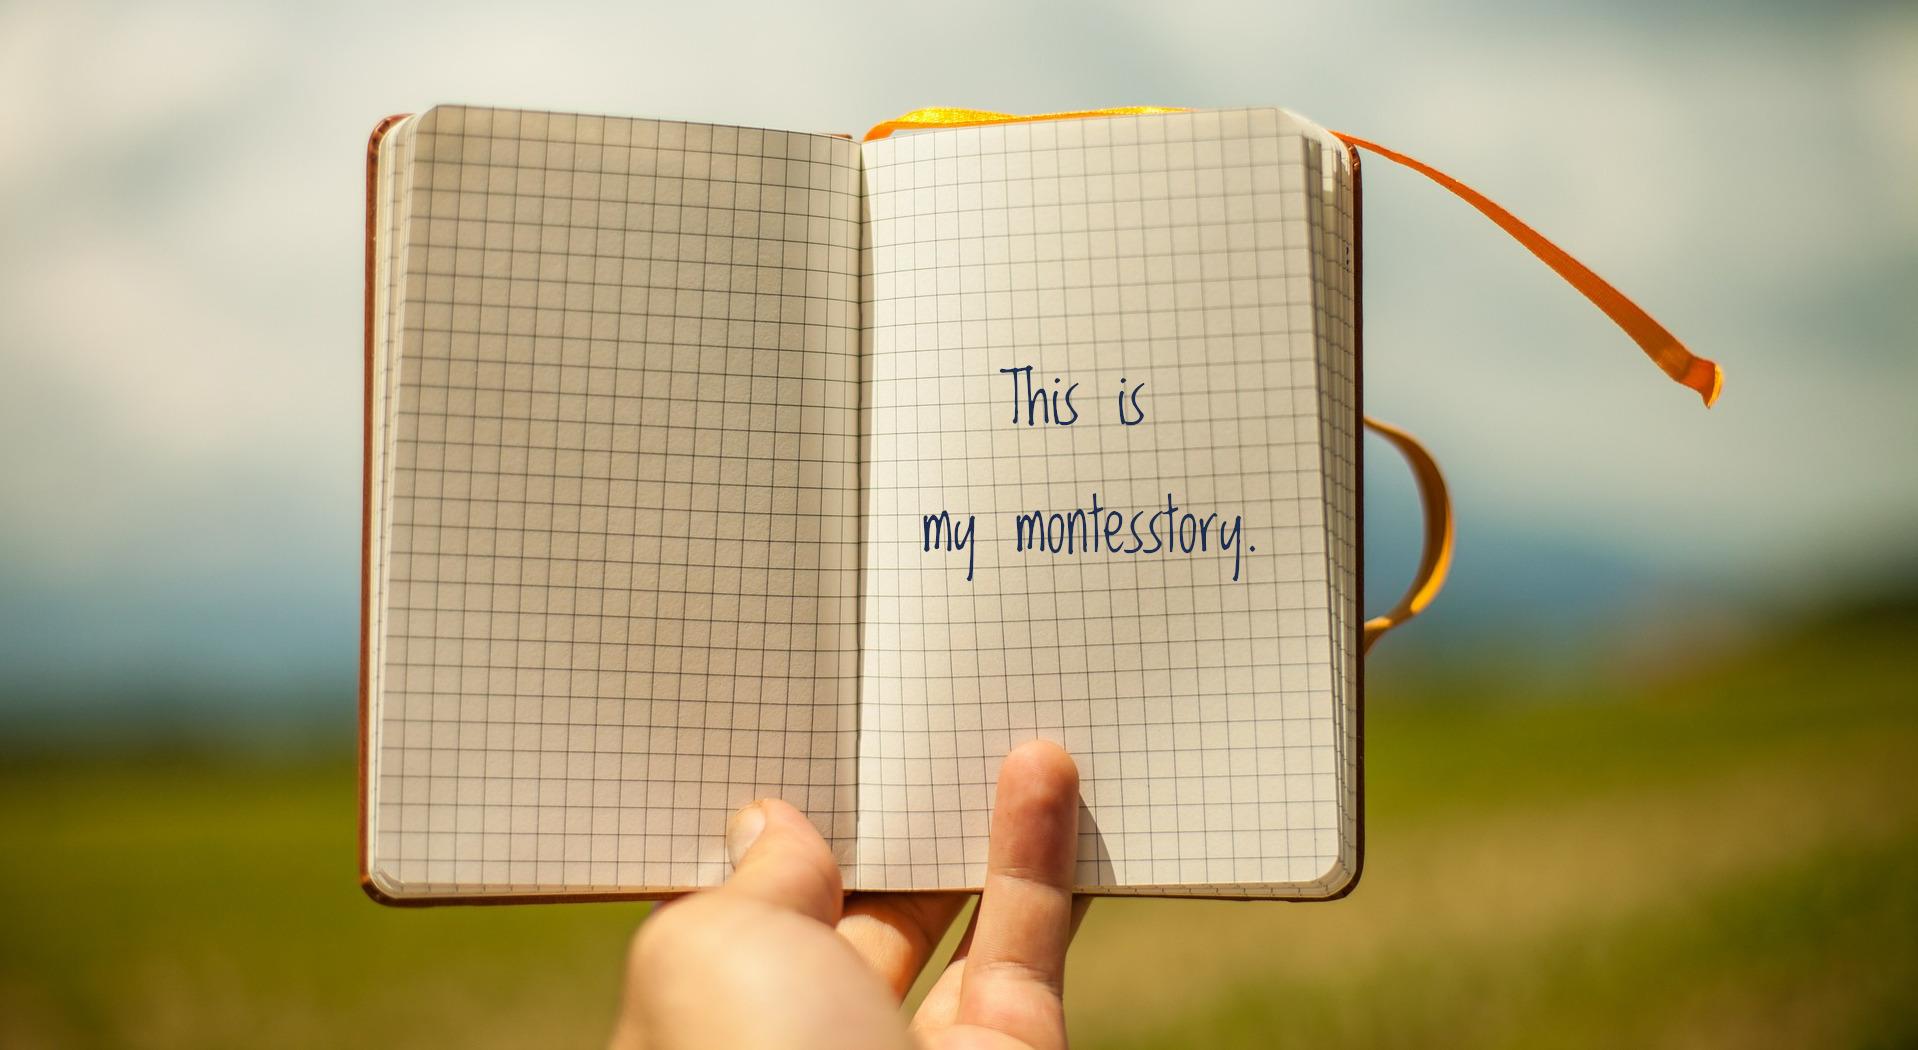 Care e my montesstory sau povestea mea Montessori?